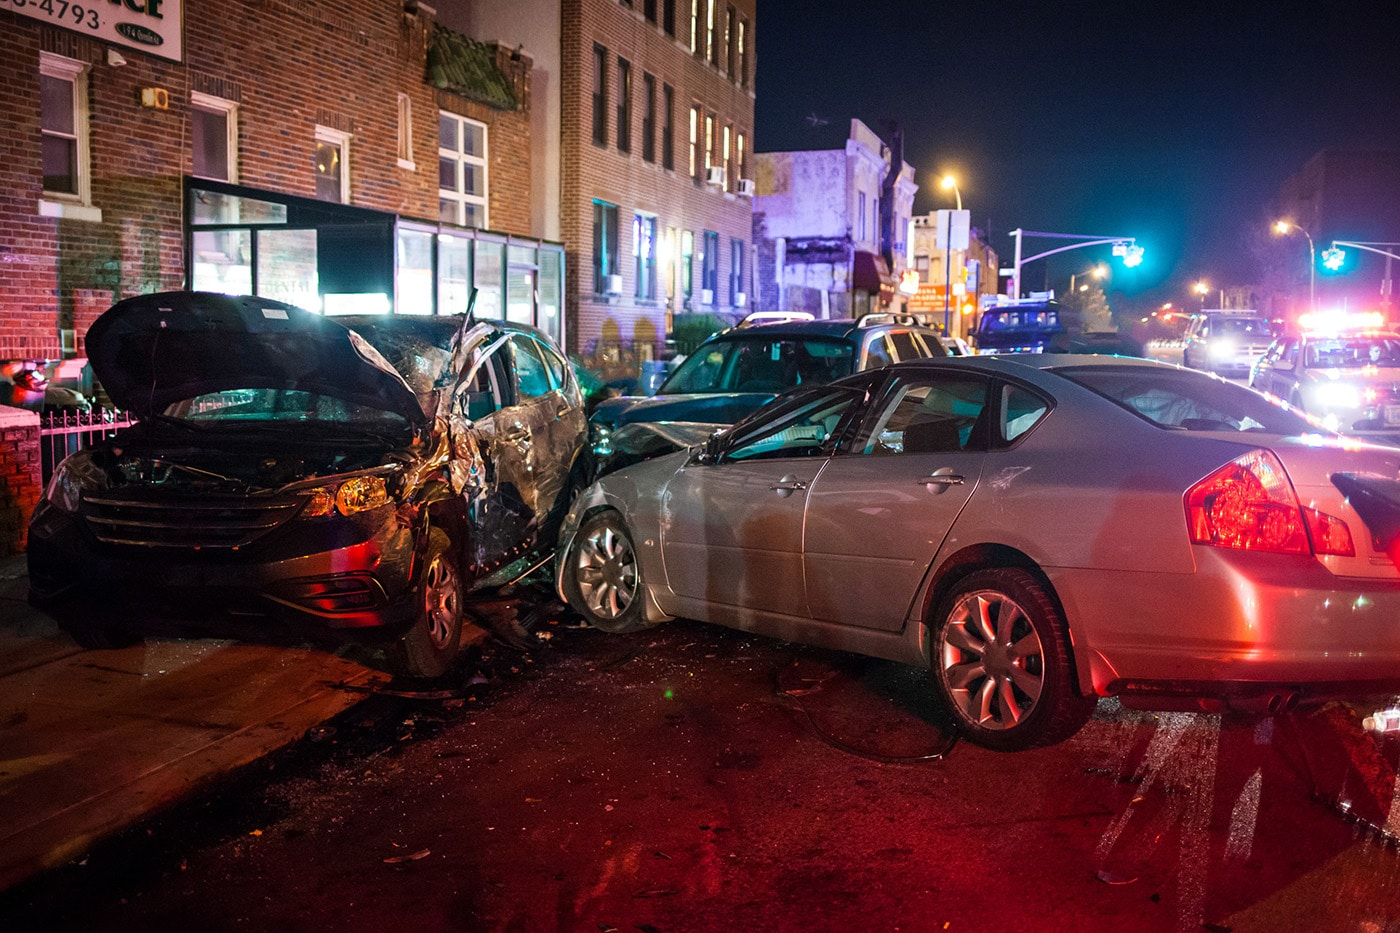 Guía de ayuda para accidentes automovilísticos